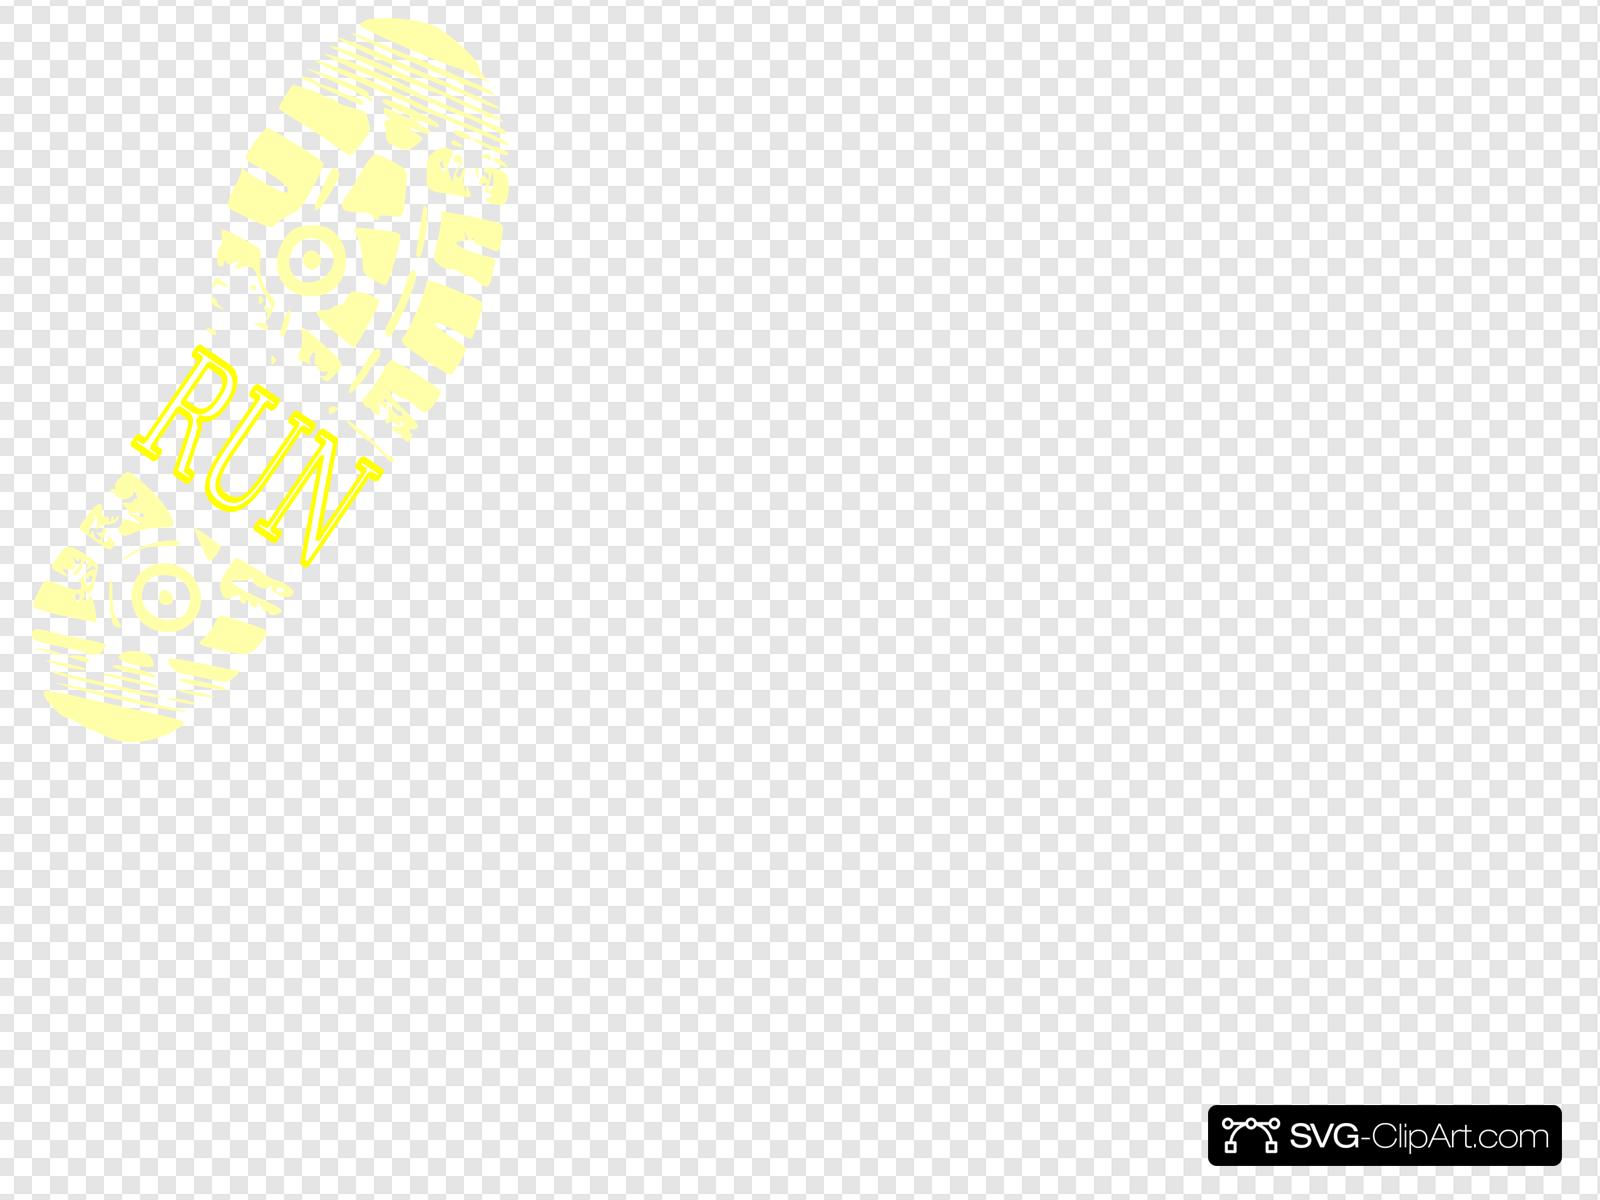 Best Buddies Clip art, Icon and SVG.